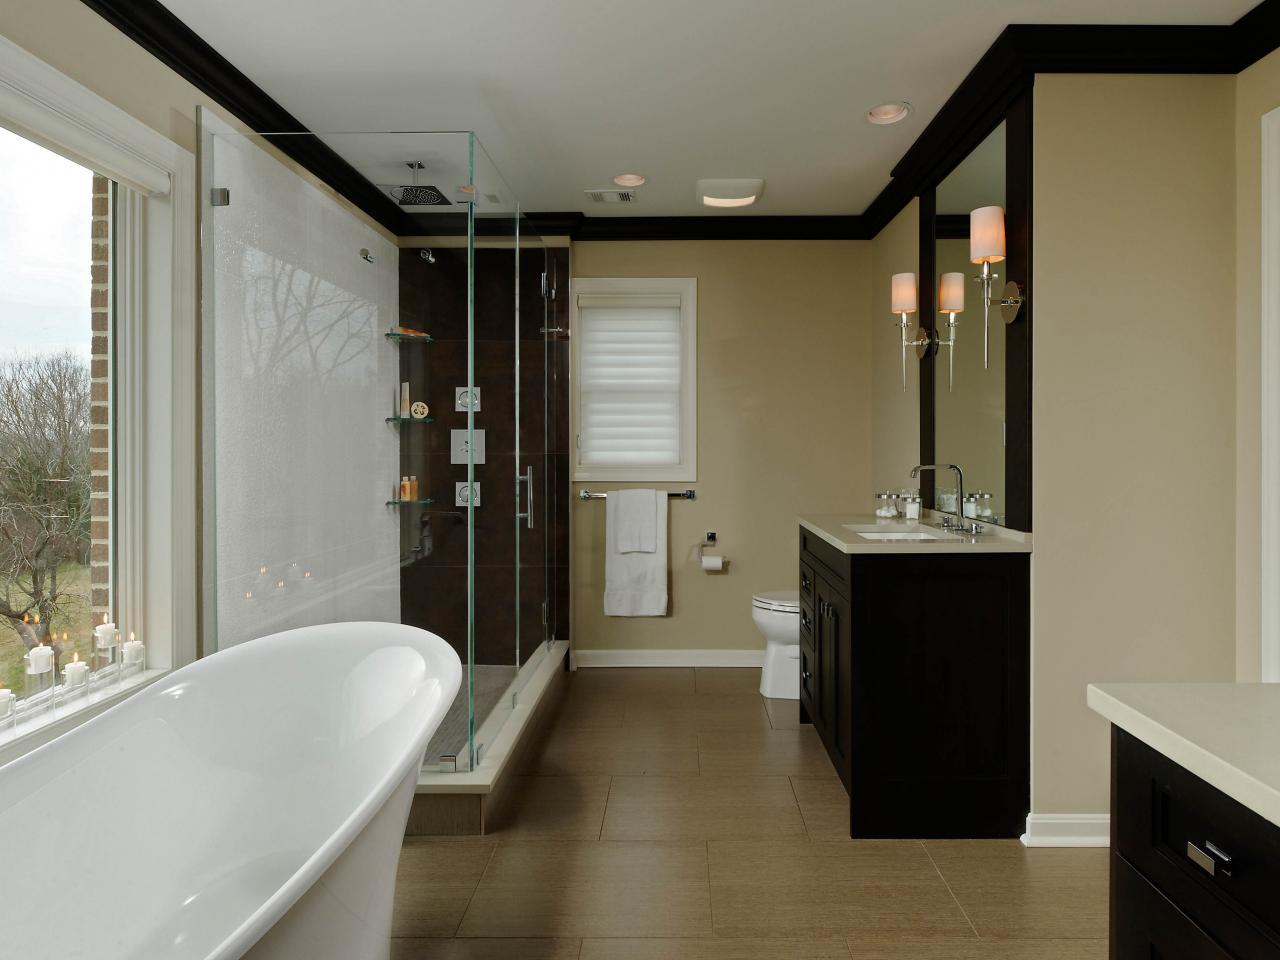 Tropical bathroom decor pictures ideas tips from hgtv for Bathroom designs lebanon